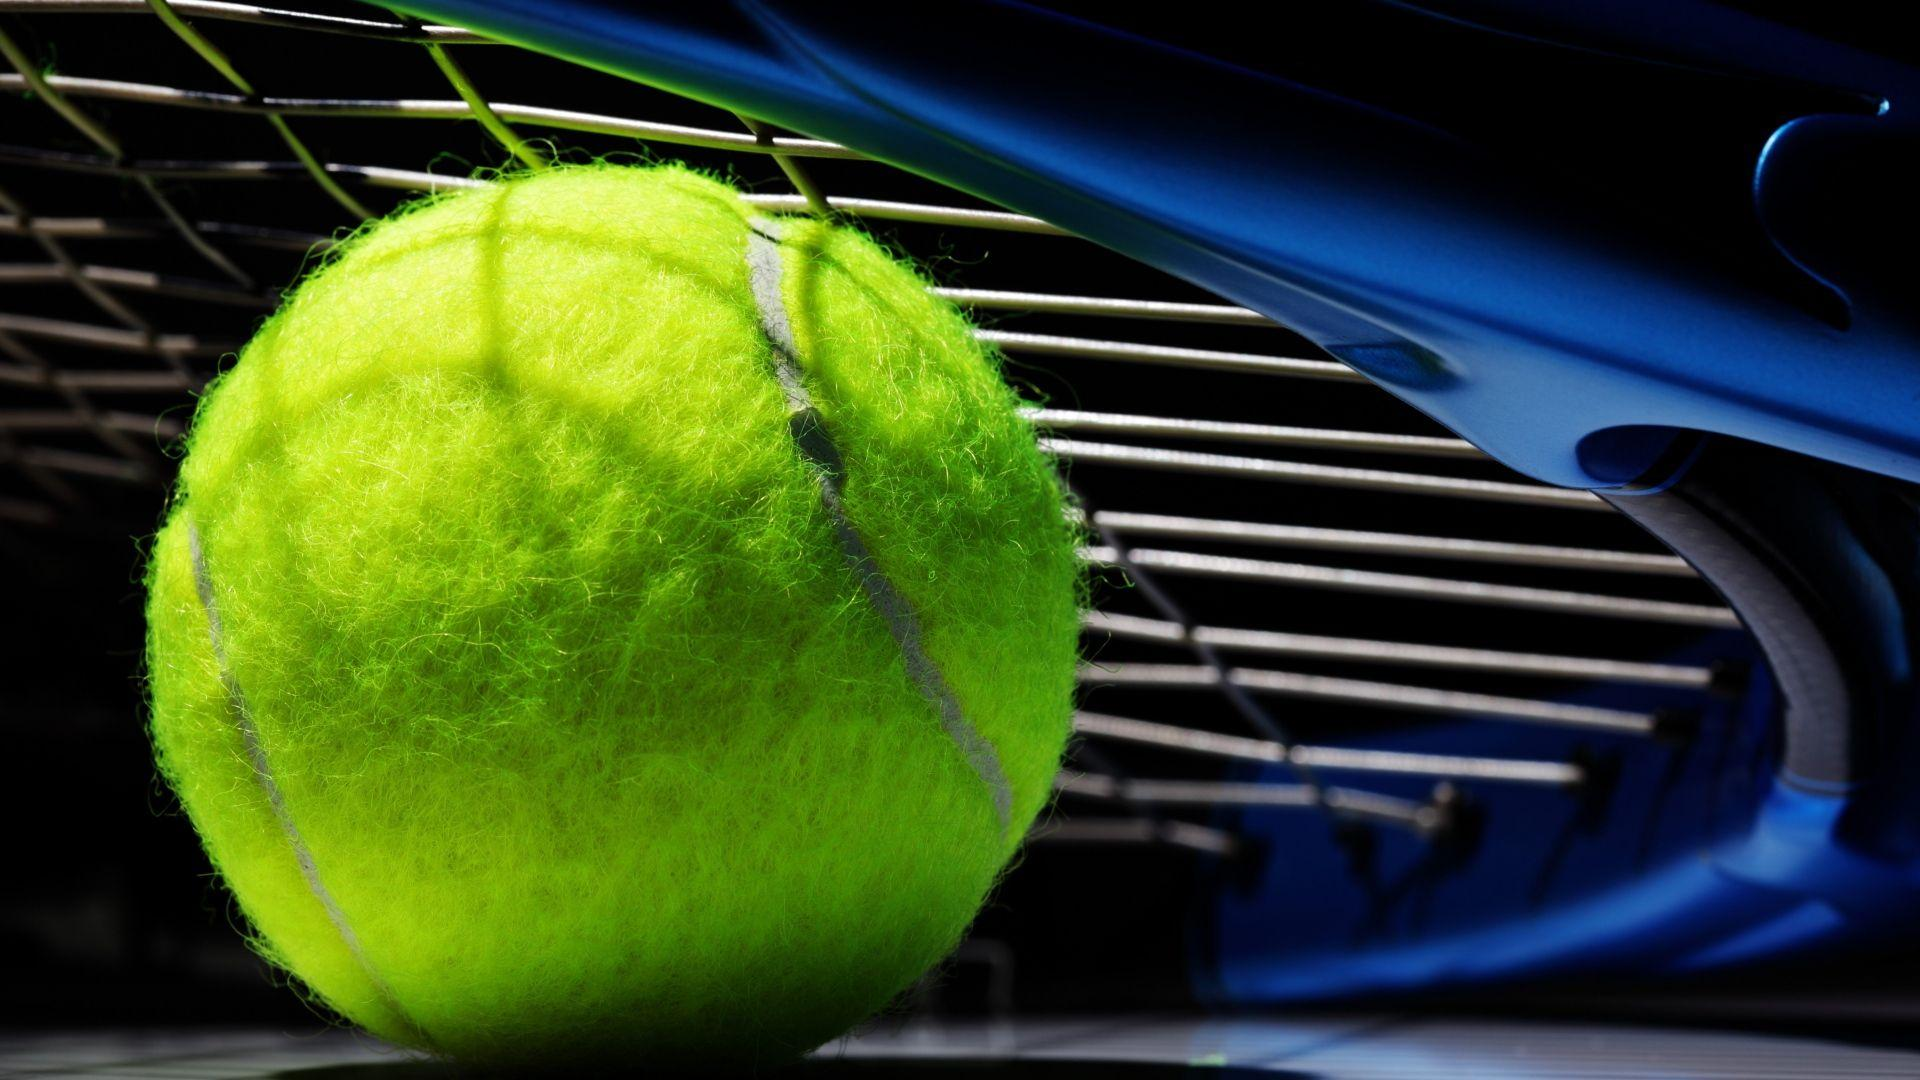 tennis screen savers